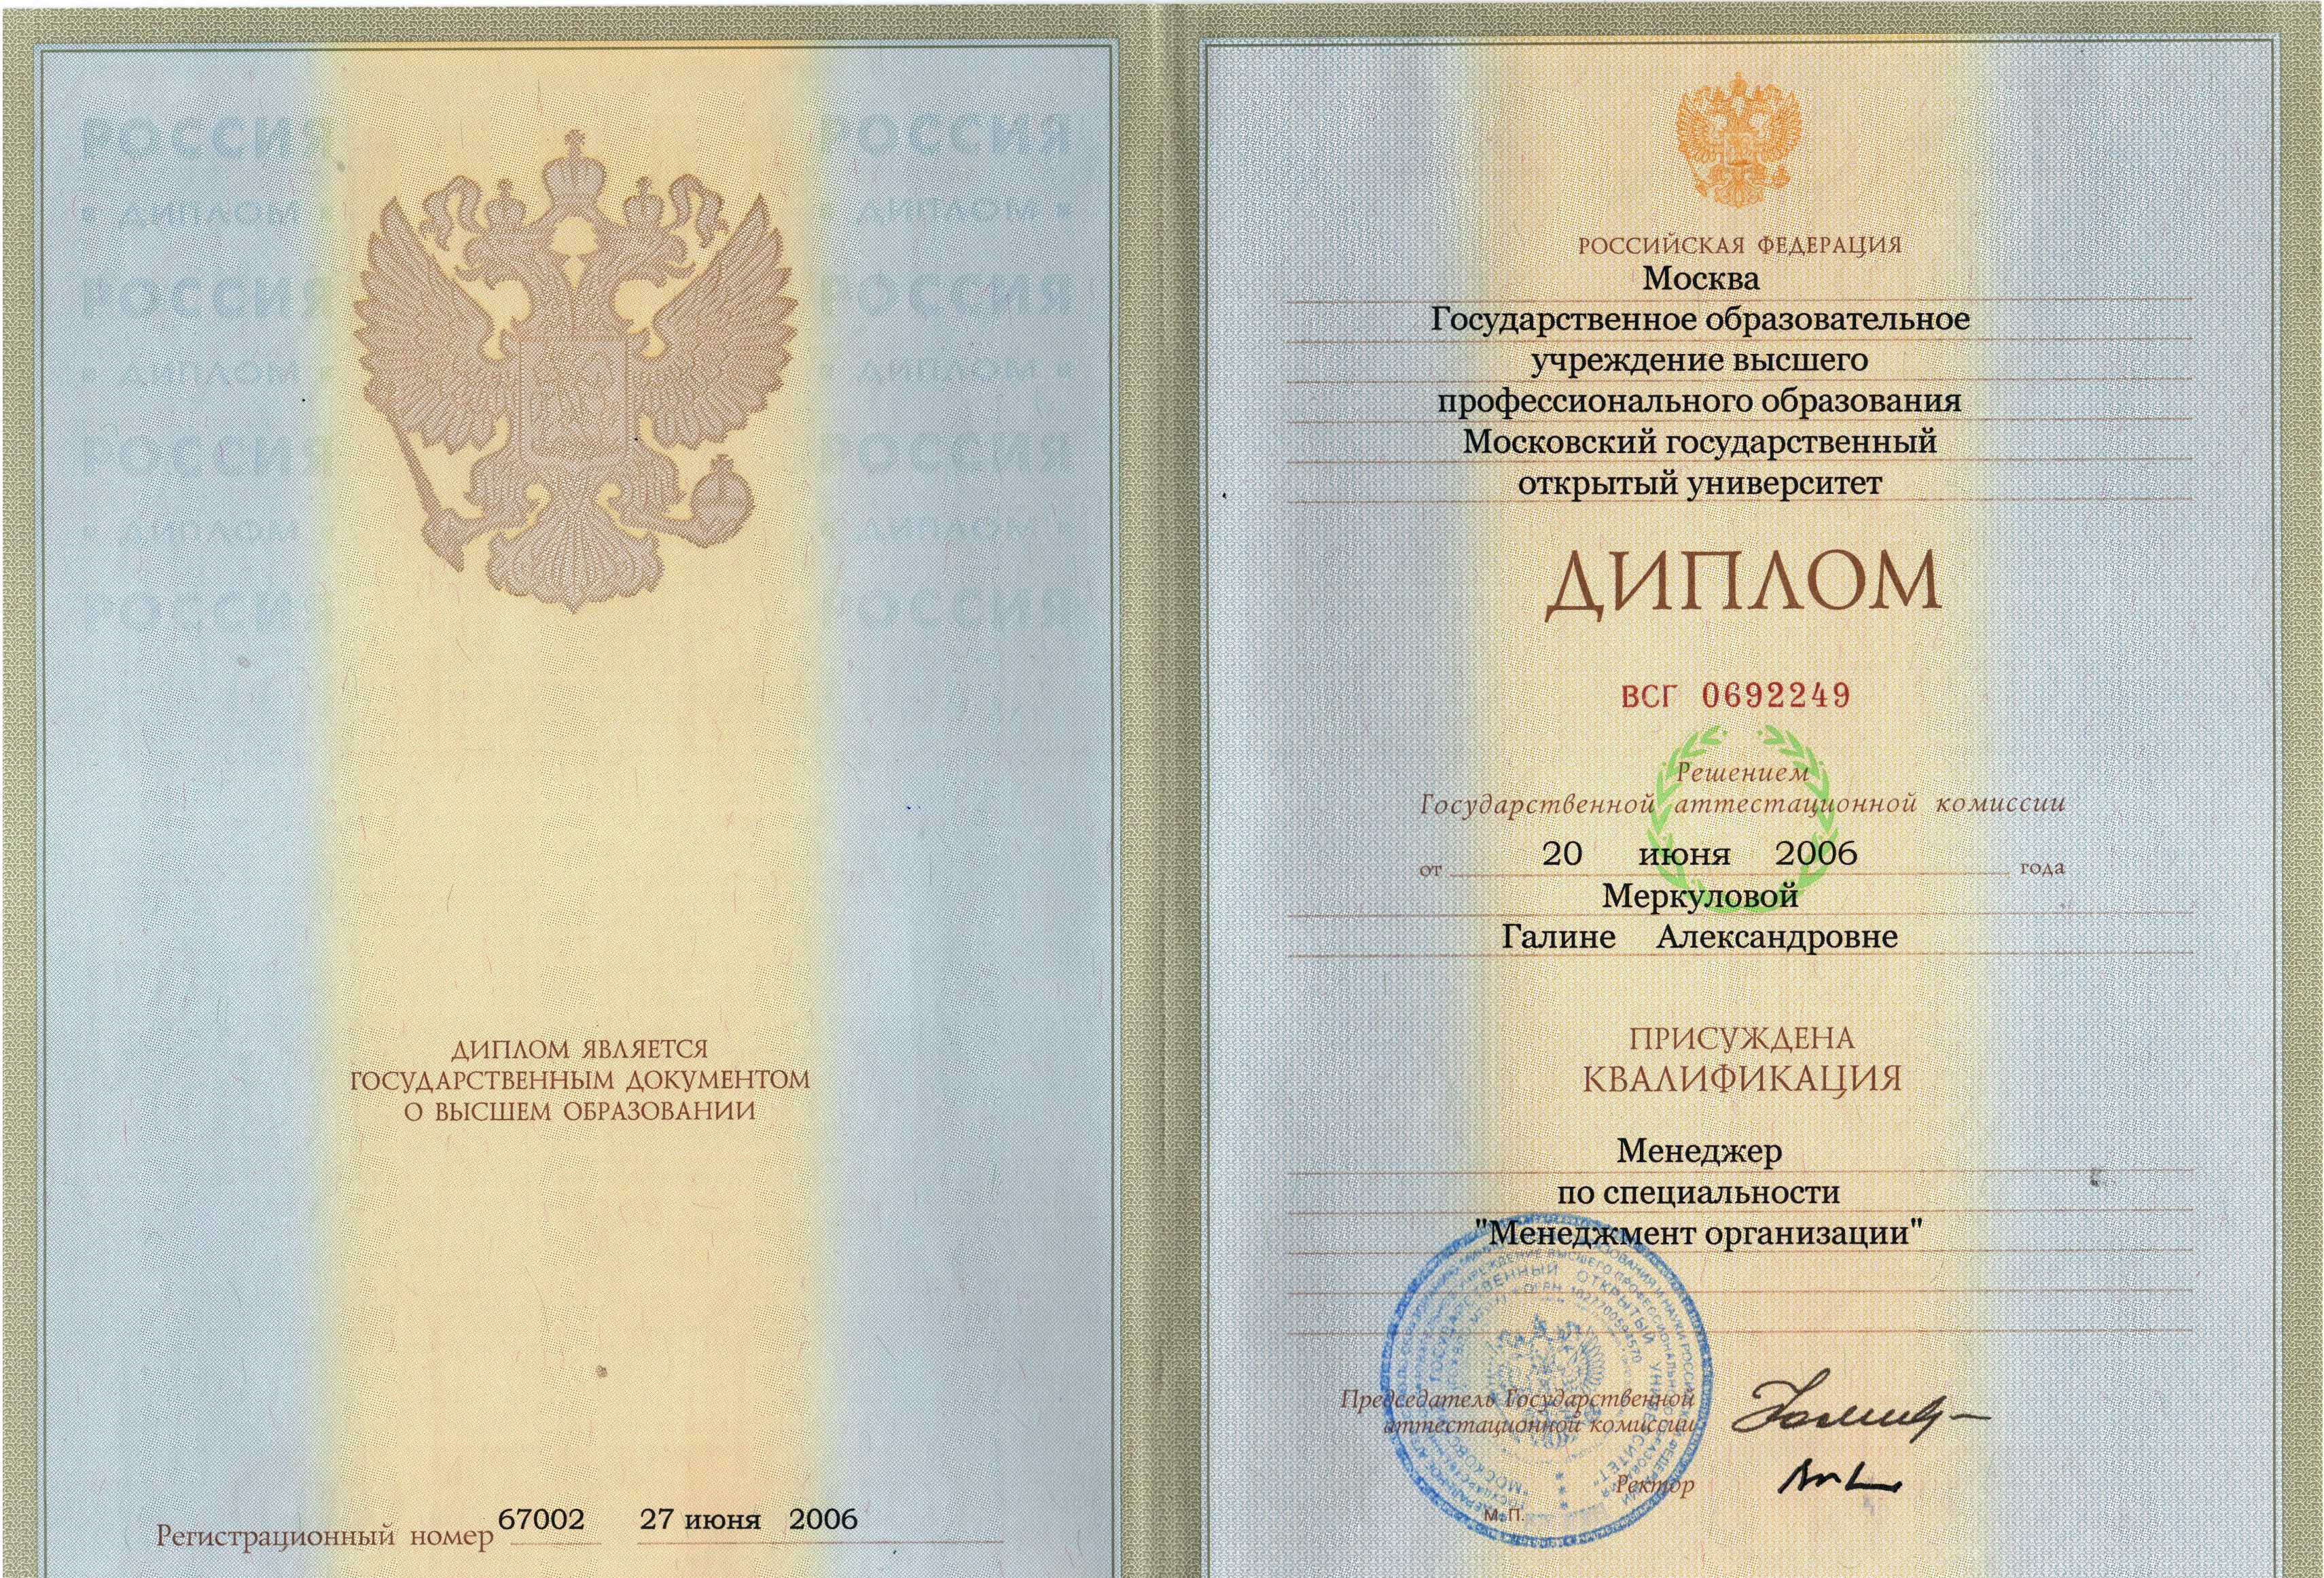 http://www.konsaltingpremium.ru/wp-content/uploads/2018/09/20180523_170903.jpg